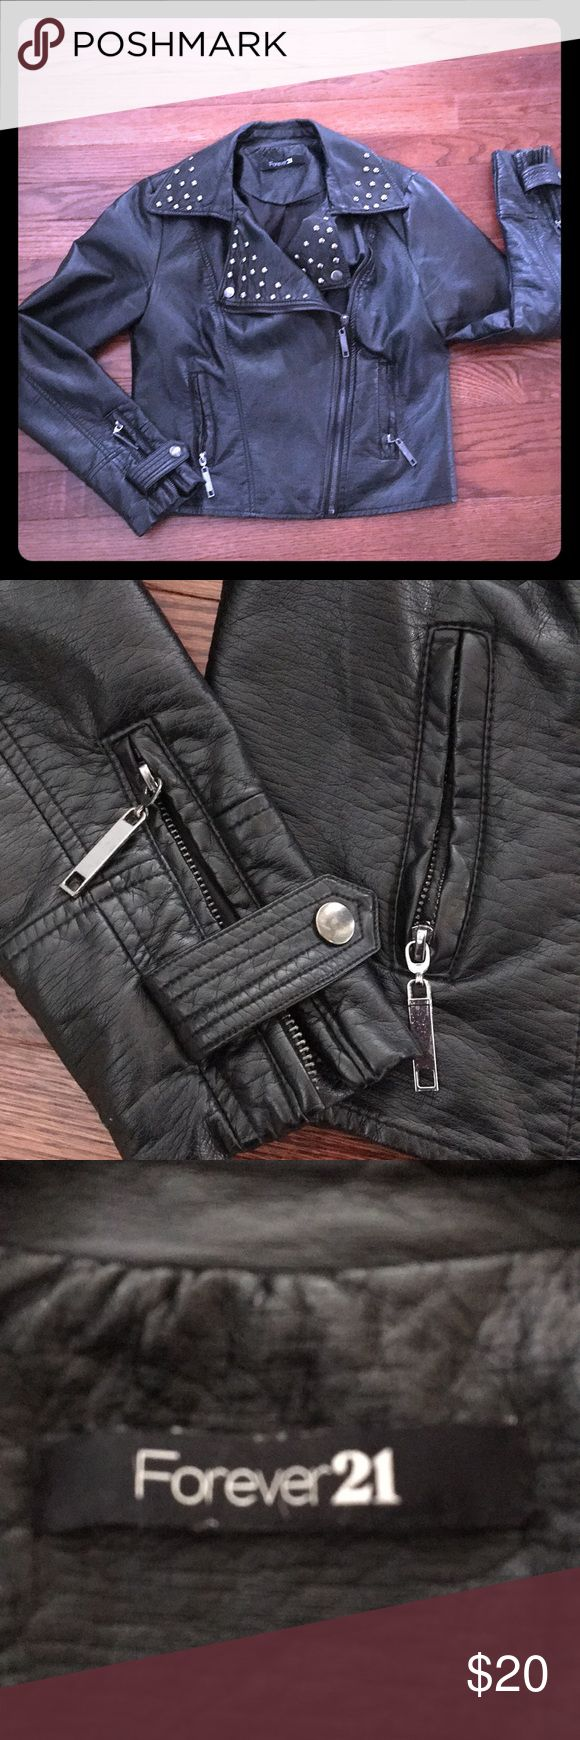 Forever 21 faux leather punk jacket Forever 21 Vegan